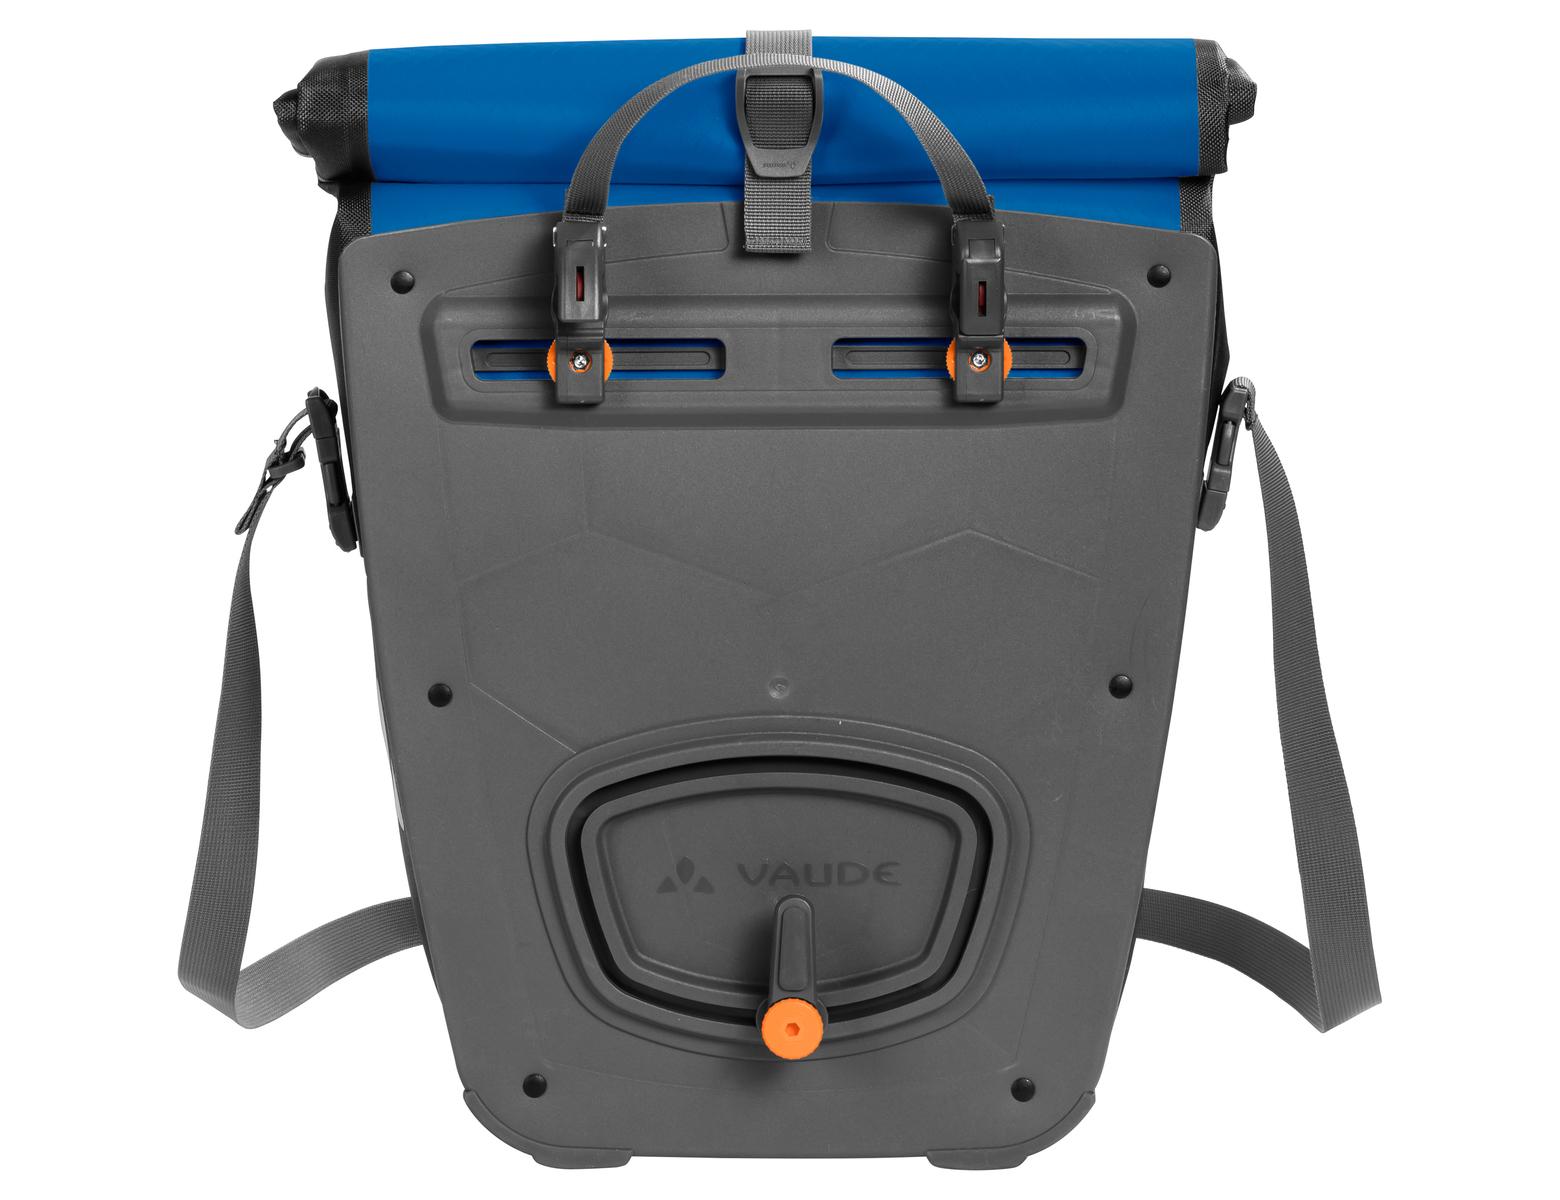 Fahrradtasche Aqua Back  Made in Germany 48 Liter - Blue